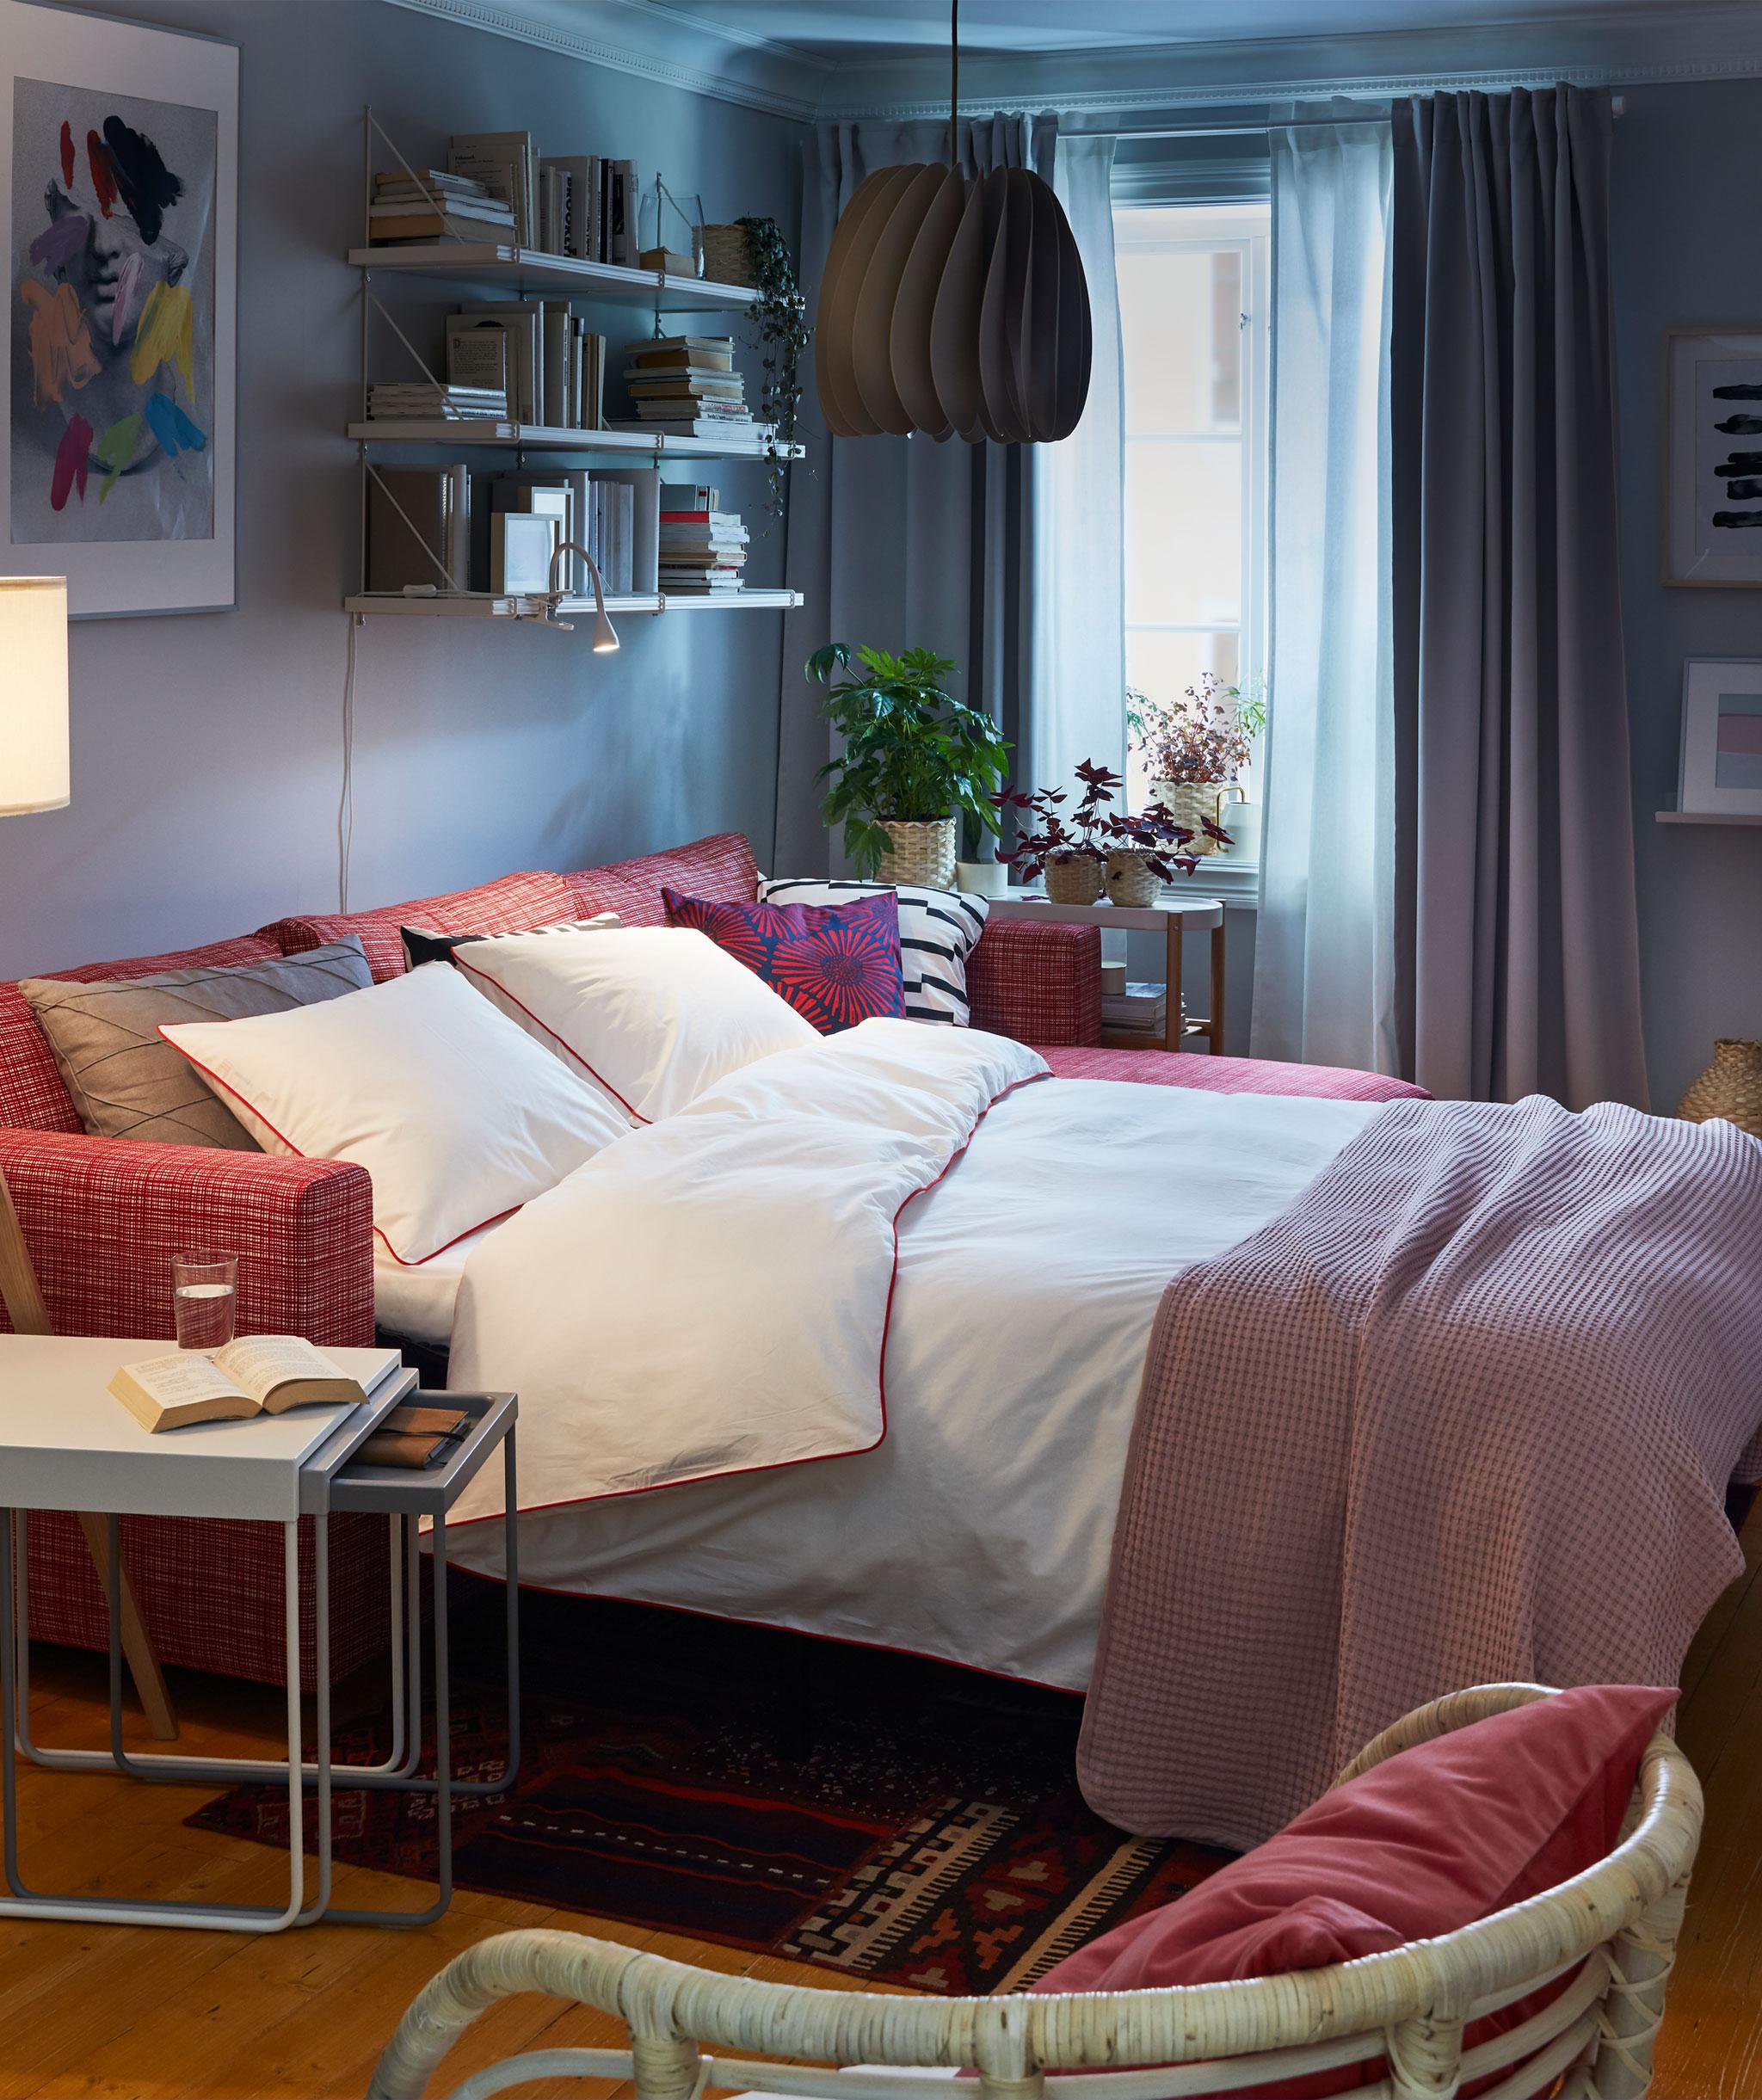 Interior ruang tamu dengan tempat tidur sofa dalam mode tempat tidur ganda. Di sekitarnya: meja tumpuk, tempat duduk, rak buku yang terpasang di dinding.